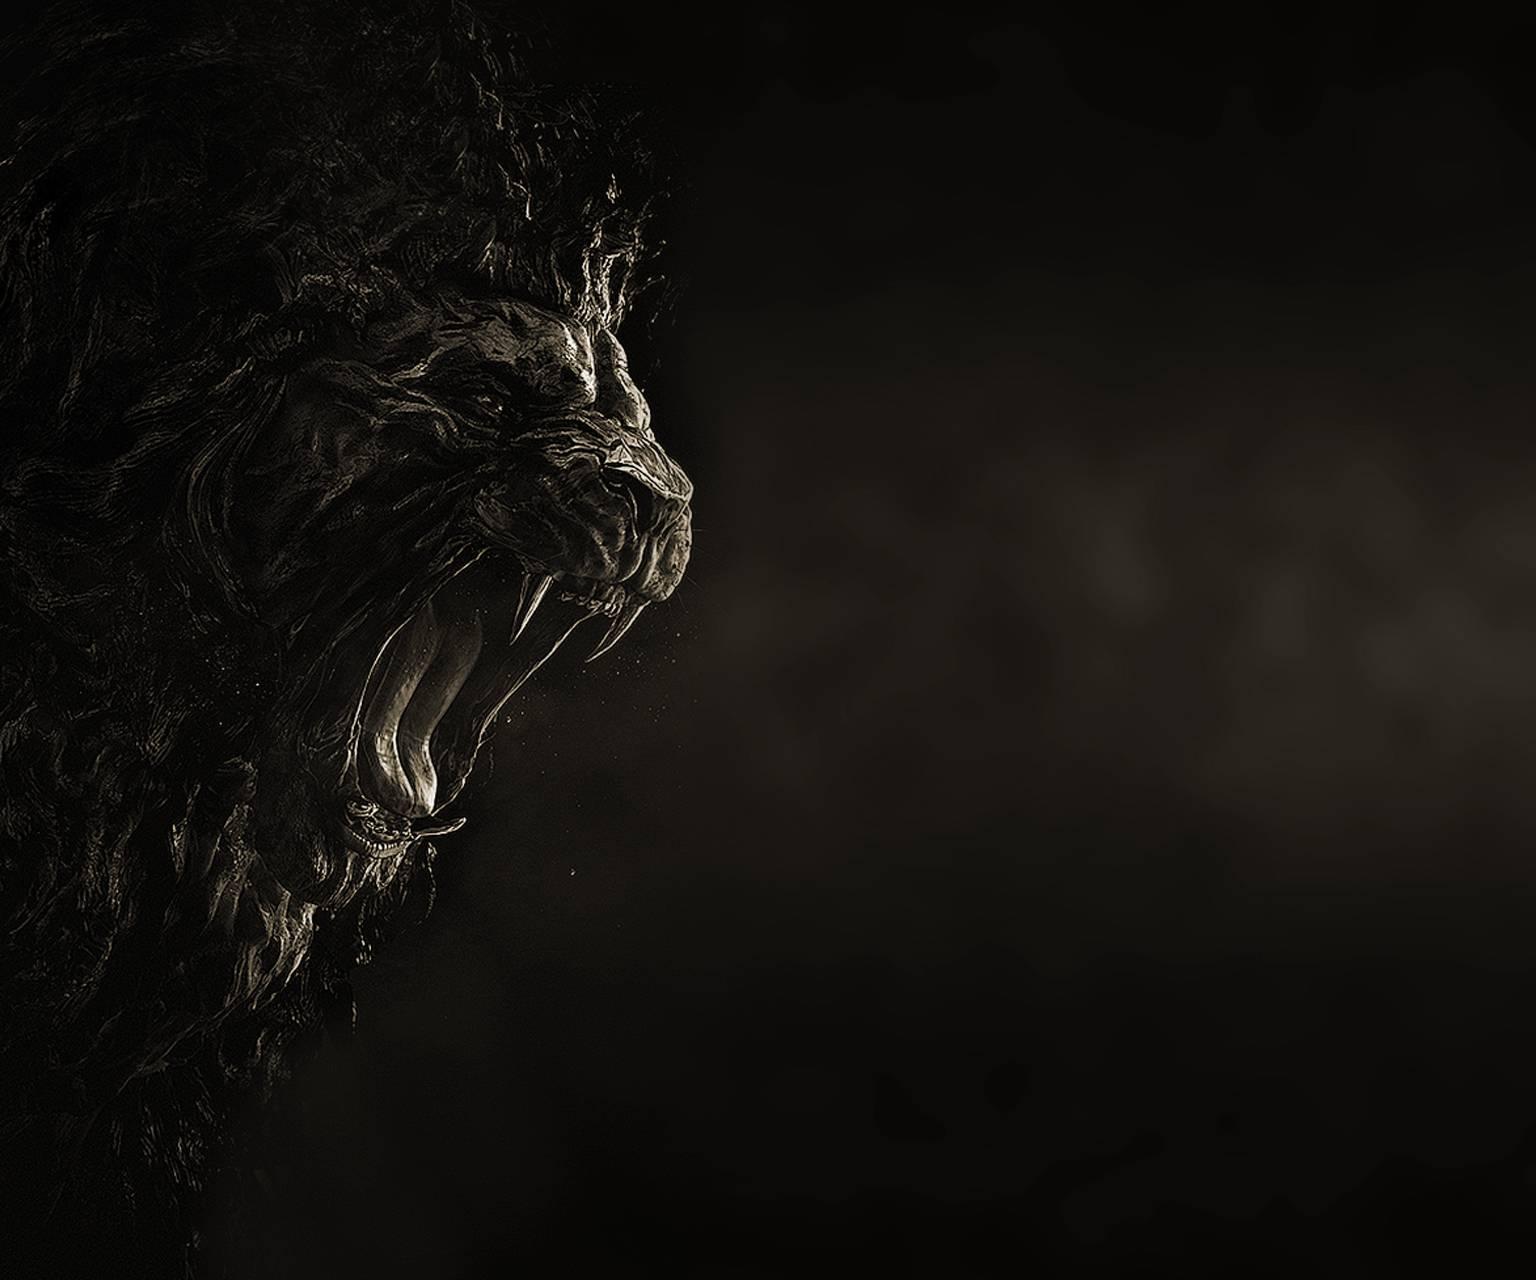 Hd Black Lion Wallpaper By Felixaricelli 74 Free On Zedge